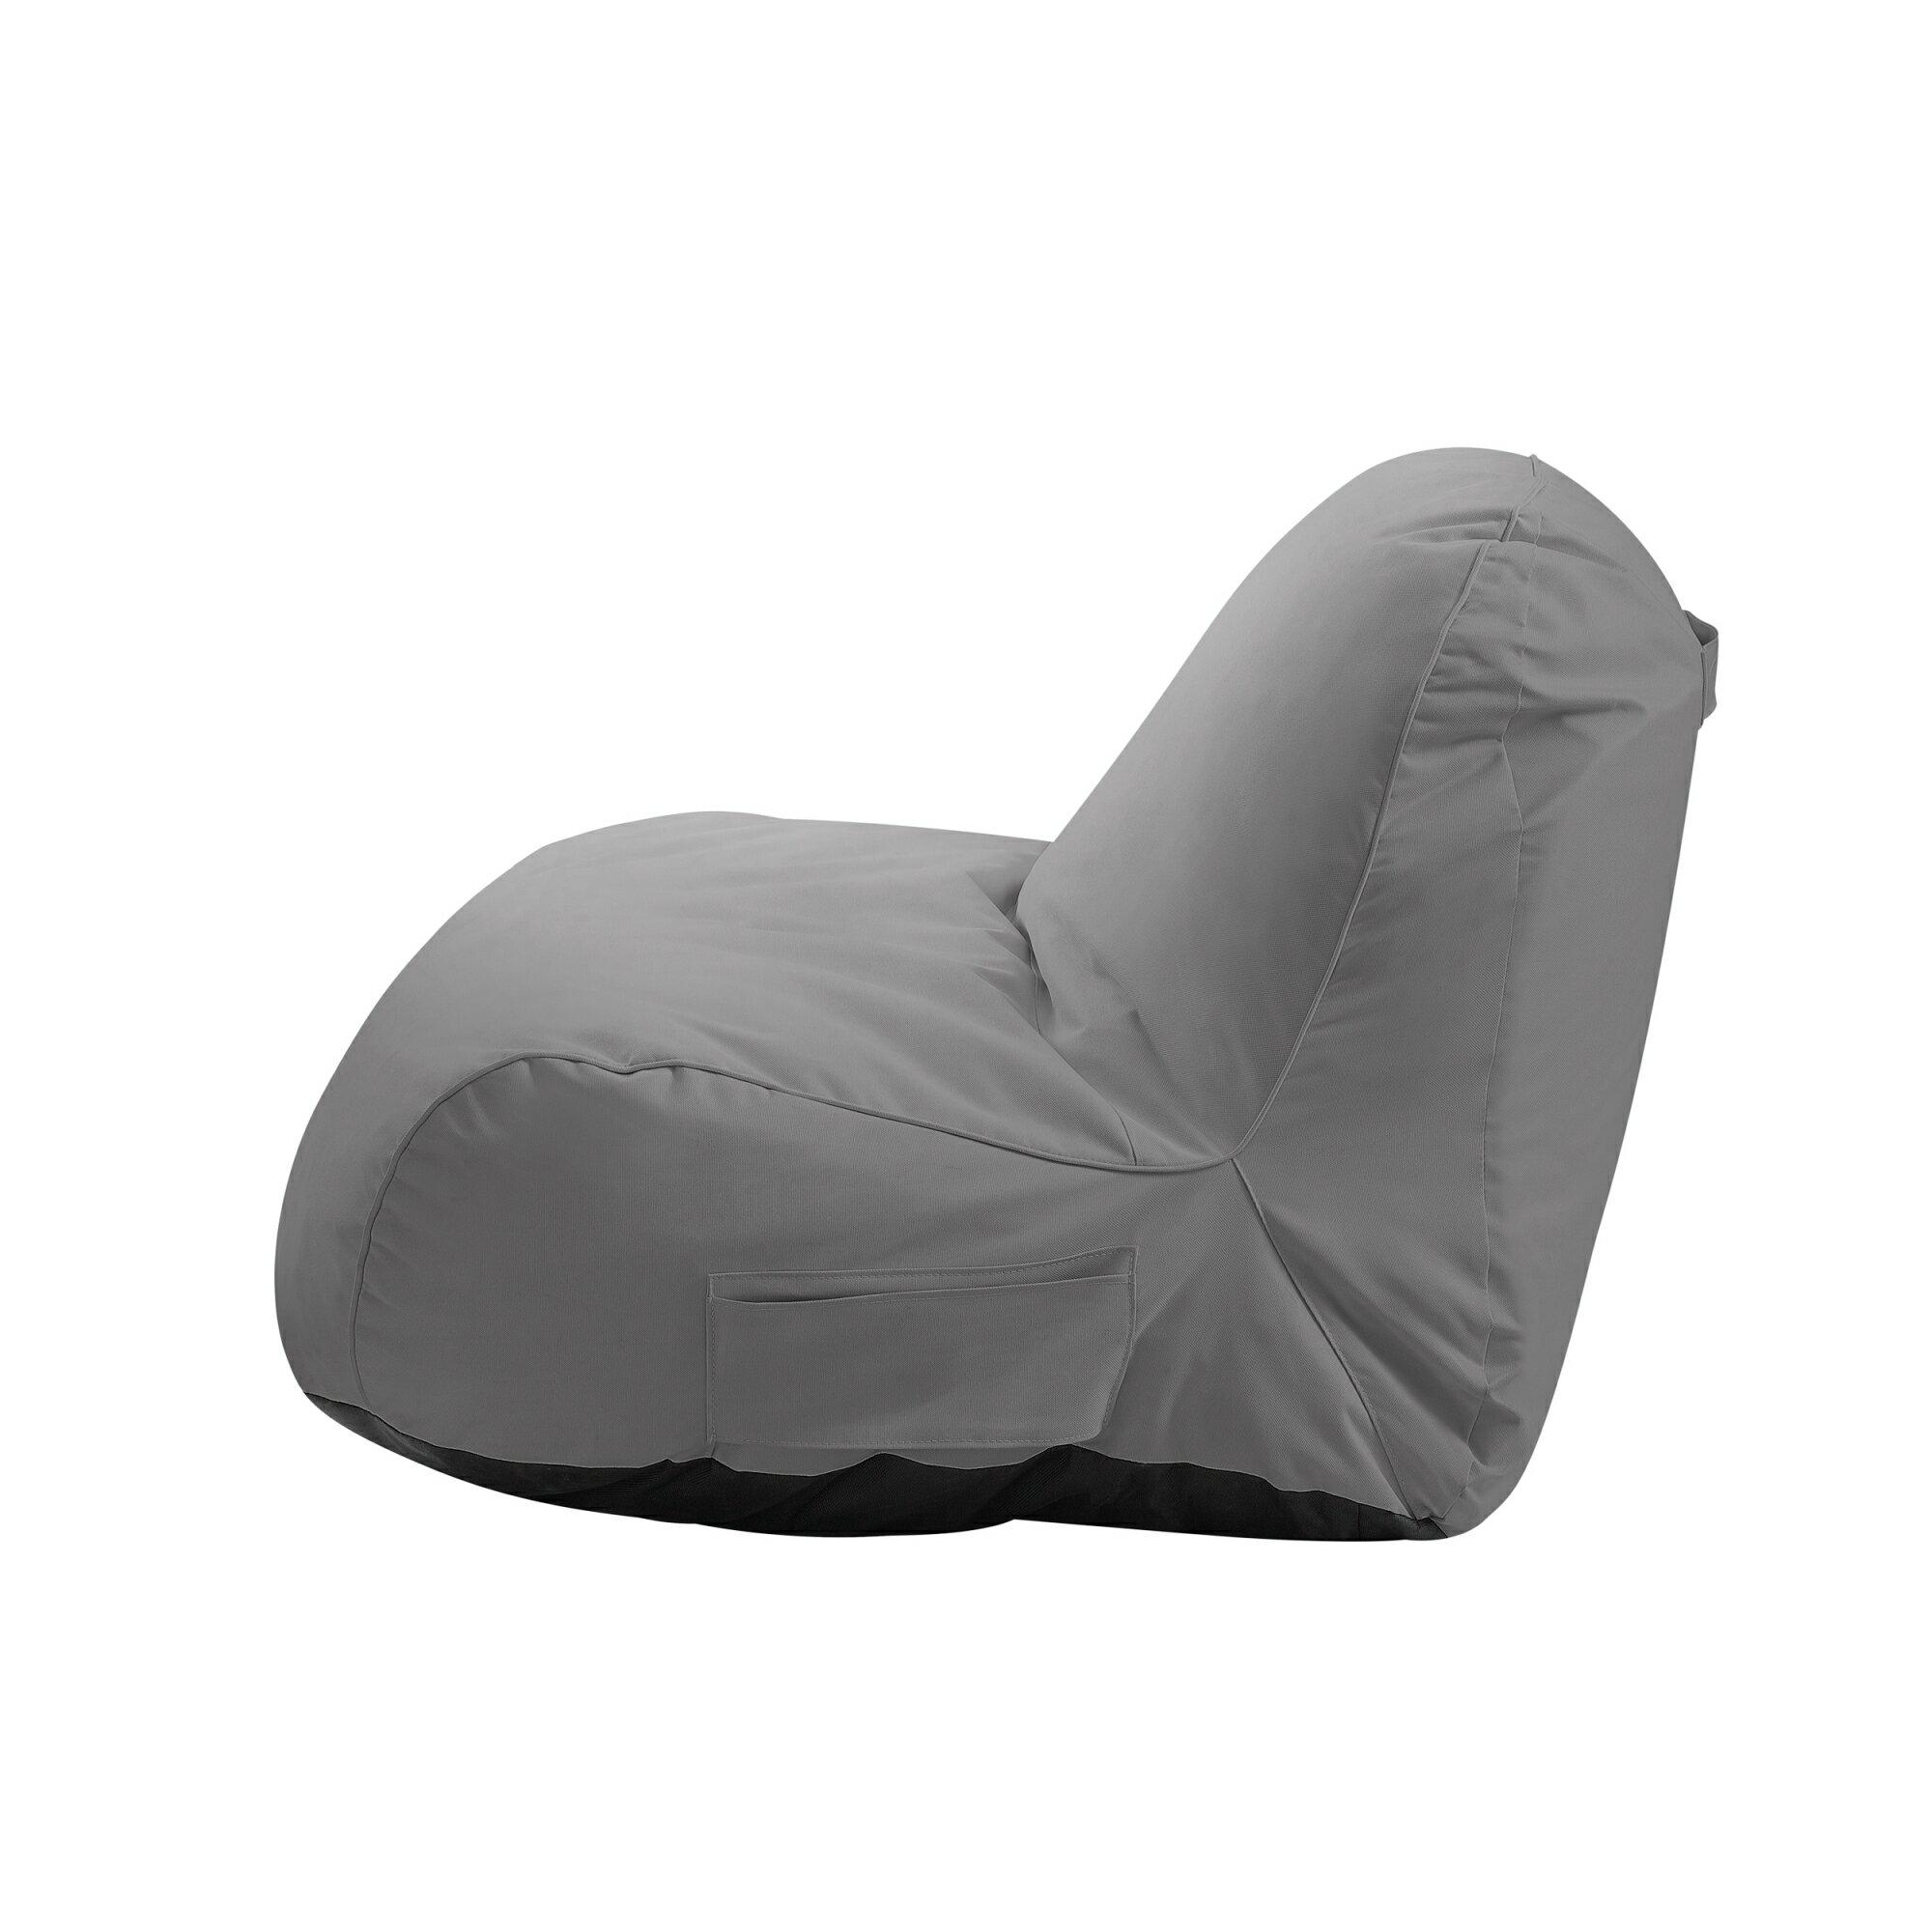 Cosmic Foam Lounge Chair Nylon Indoor Outdoor Self Expanding Water Resistant Loungie